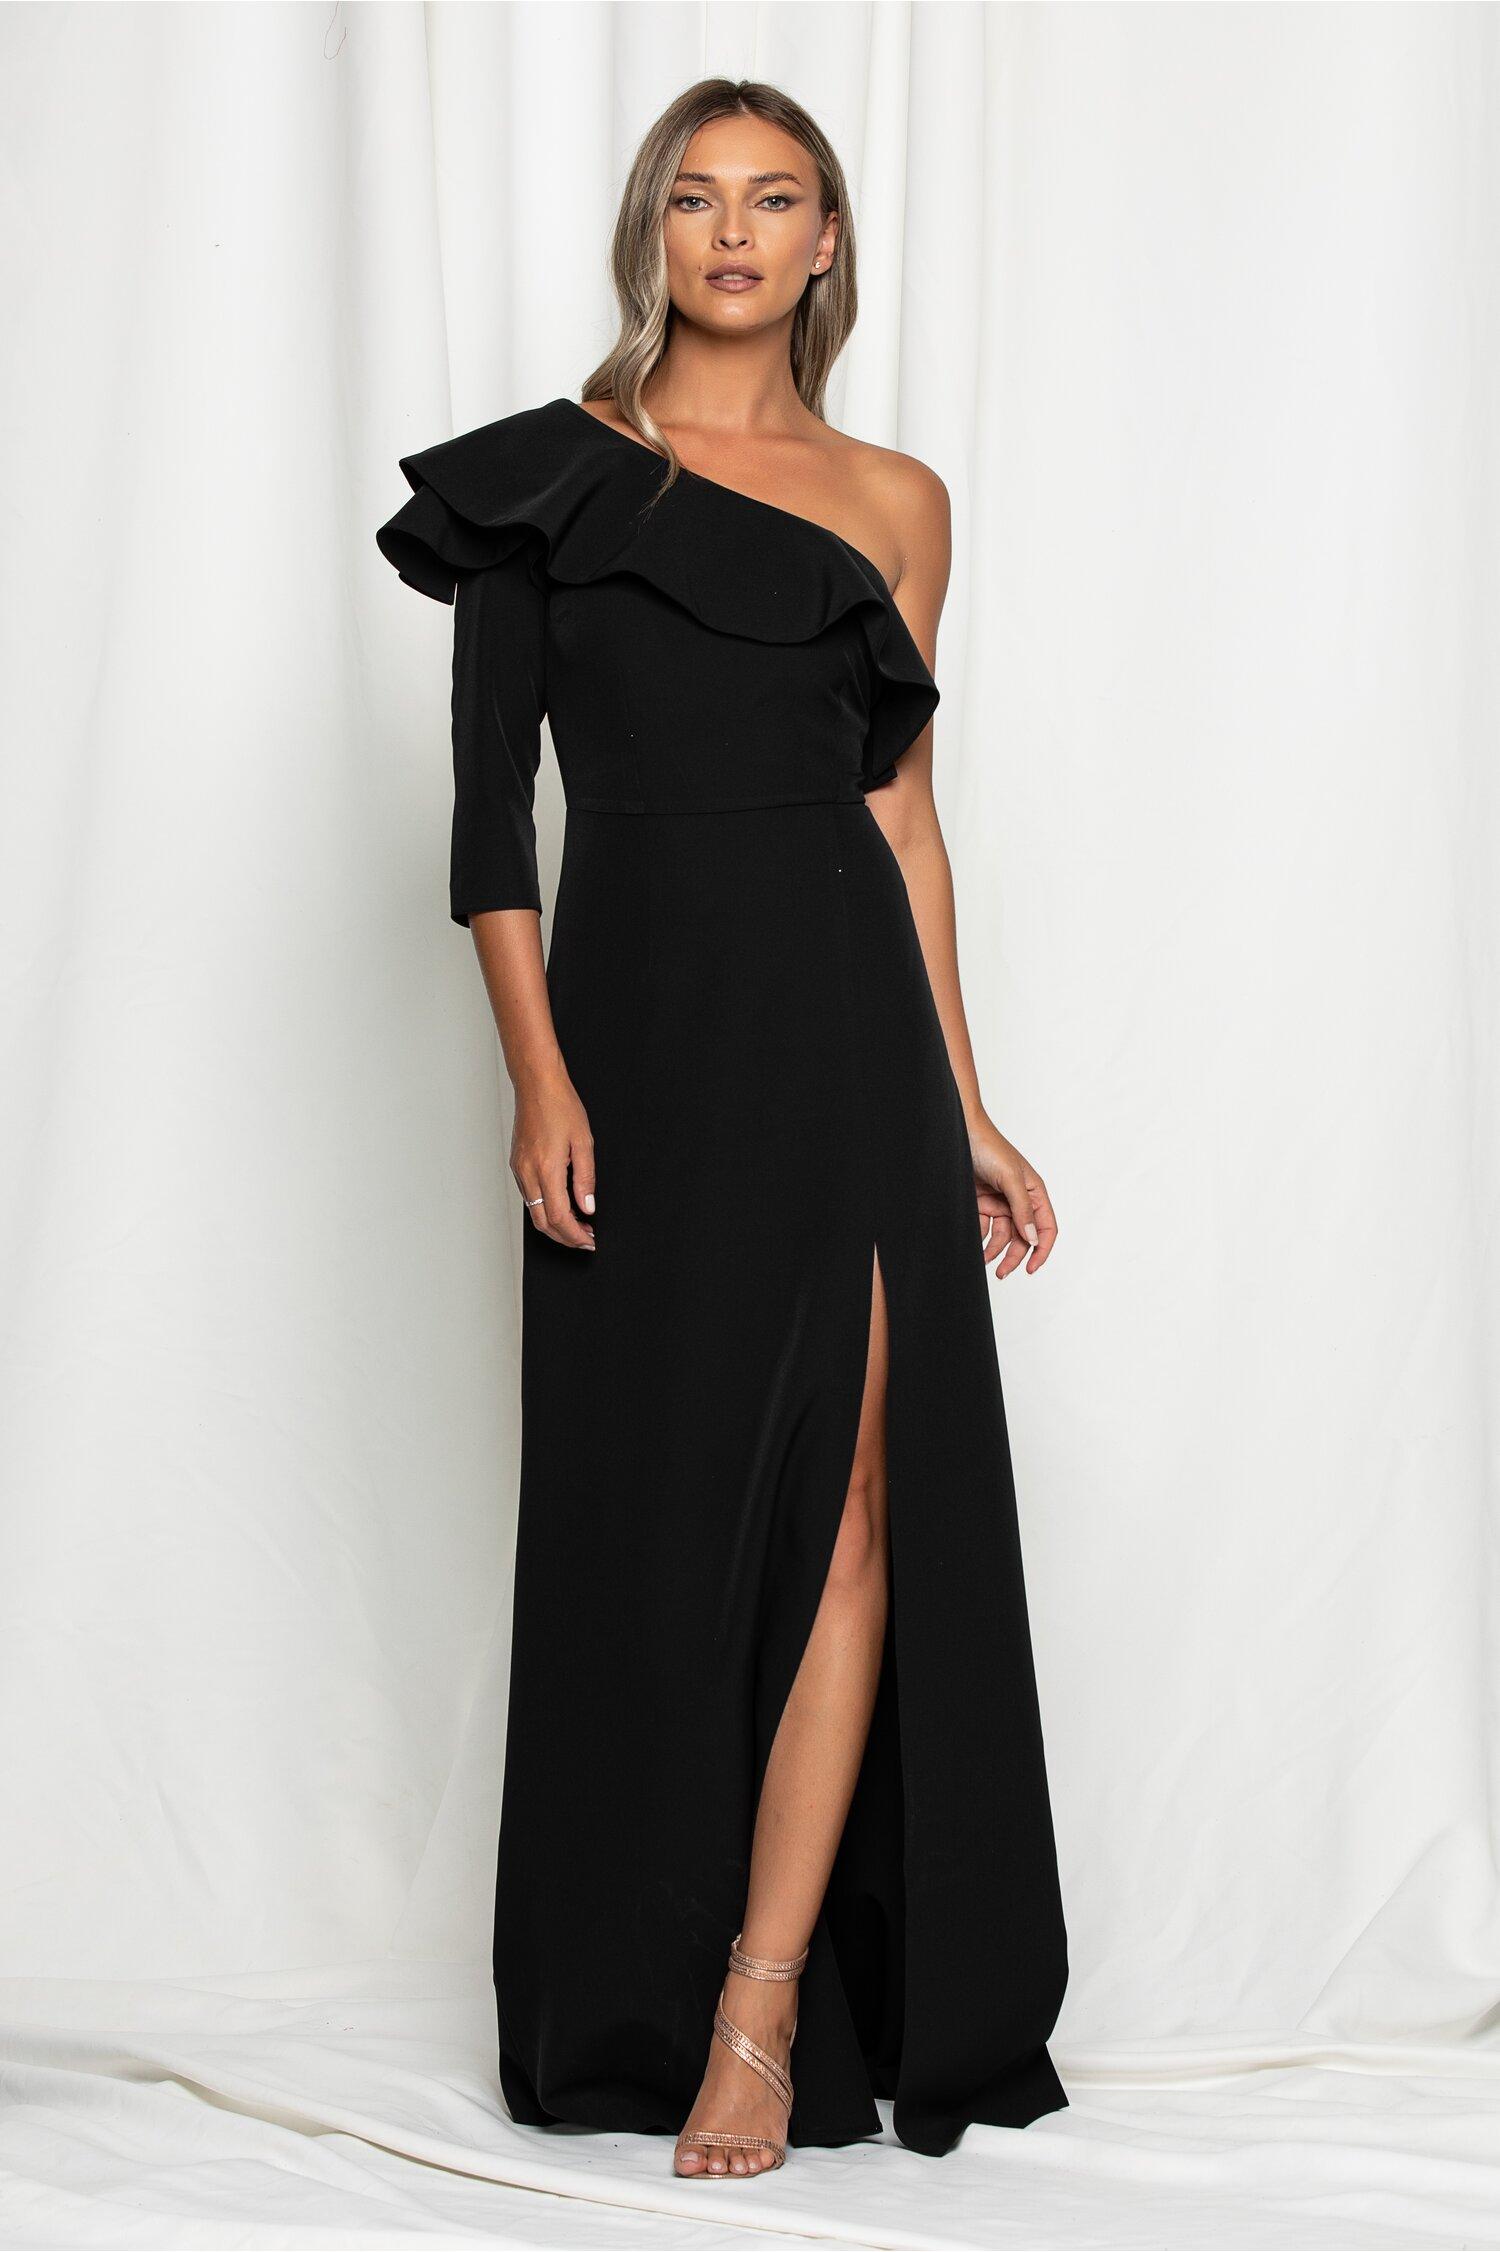 Rochie DY Fashion Daria neagra cu decolteu asimetric si volan